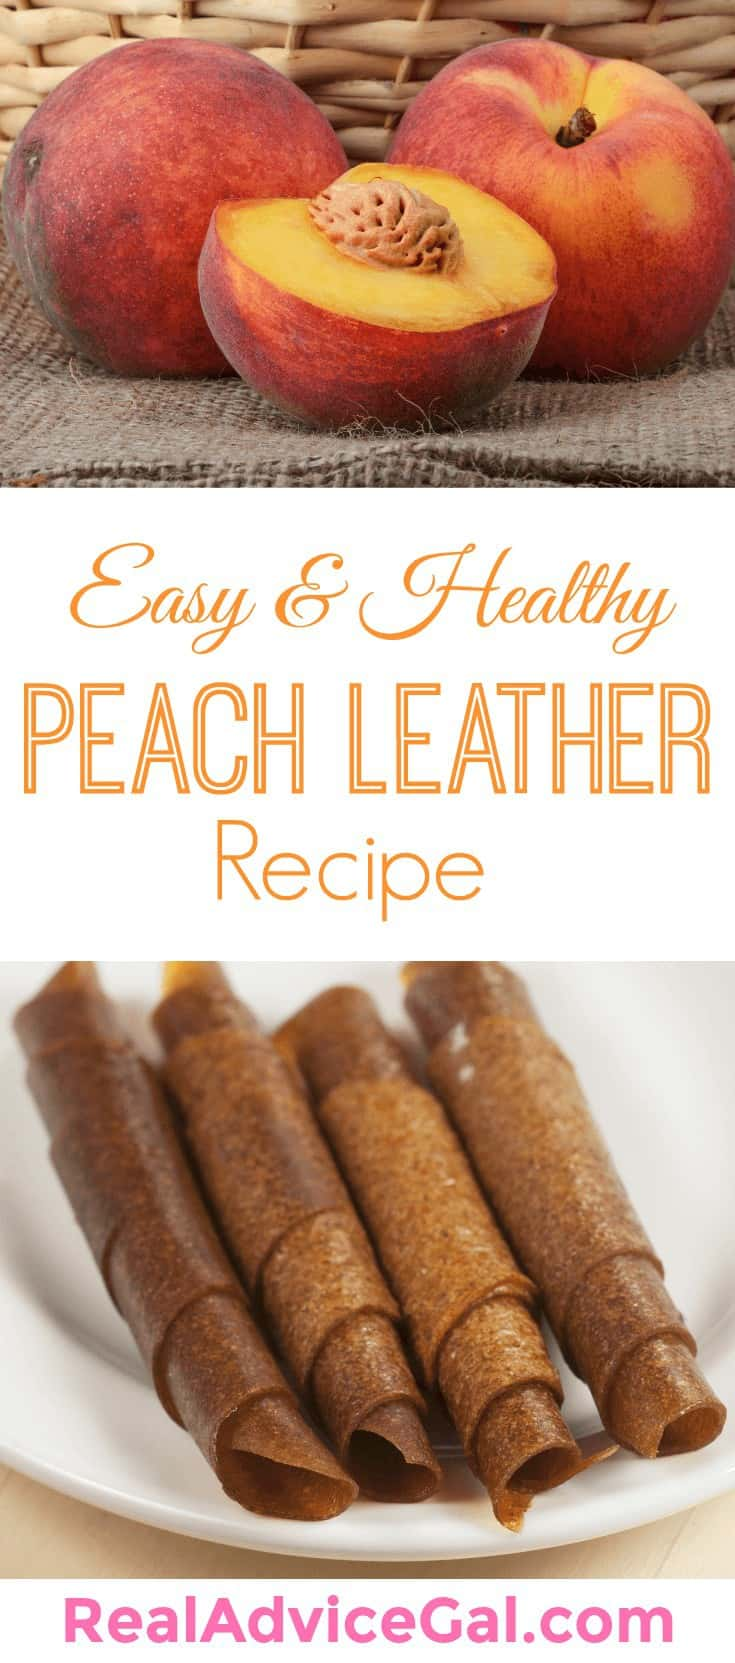 Easy peach leather recipe